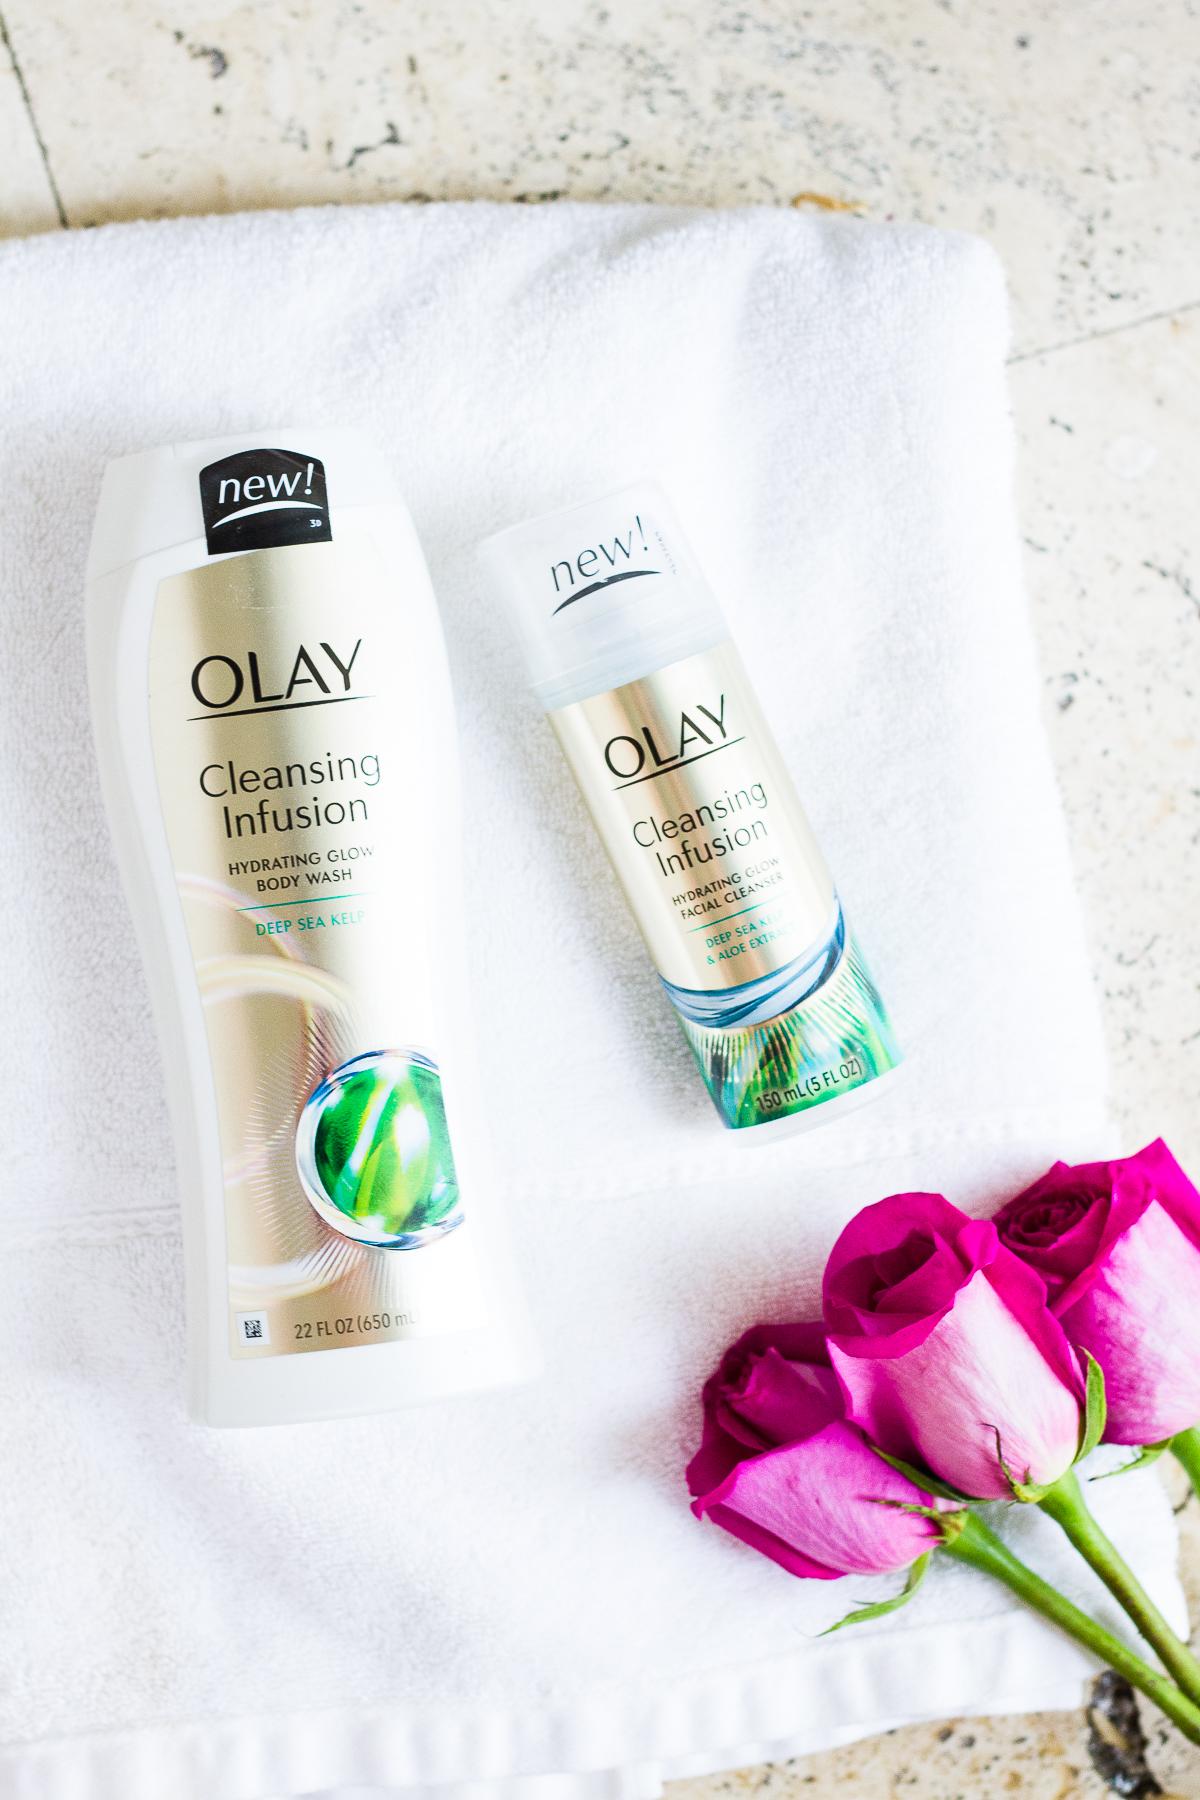 Olay Glow Up-2